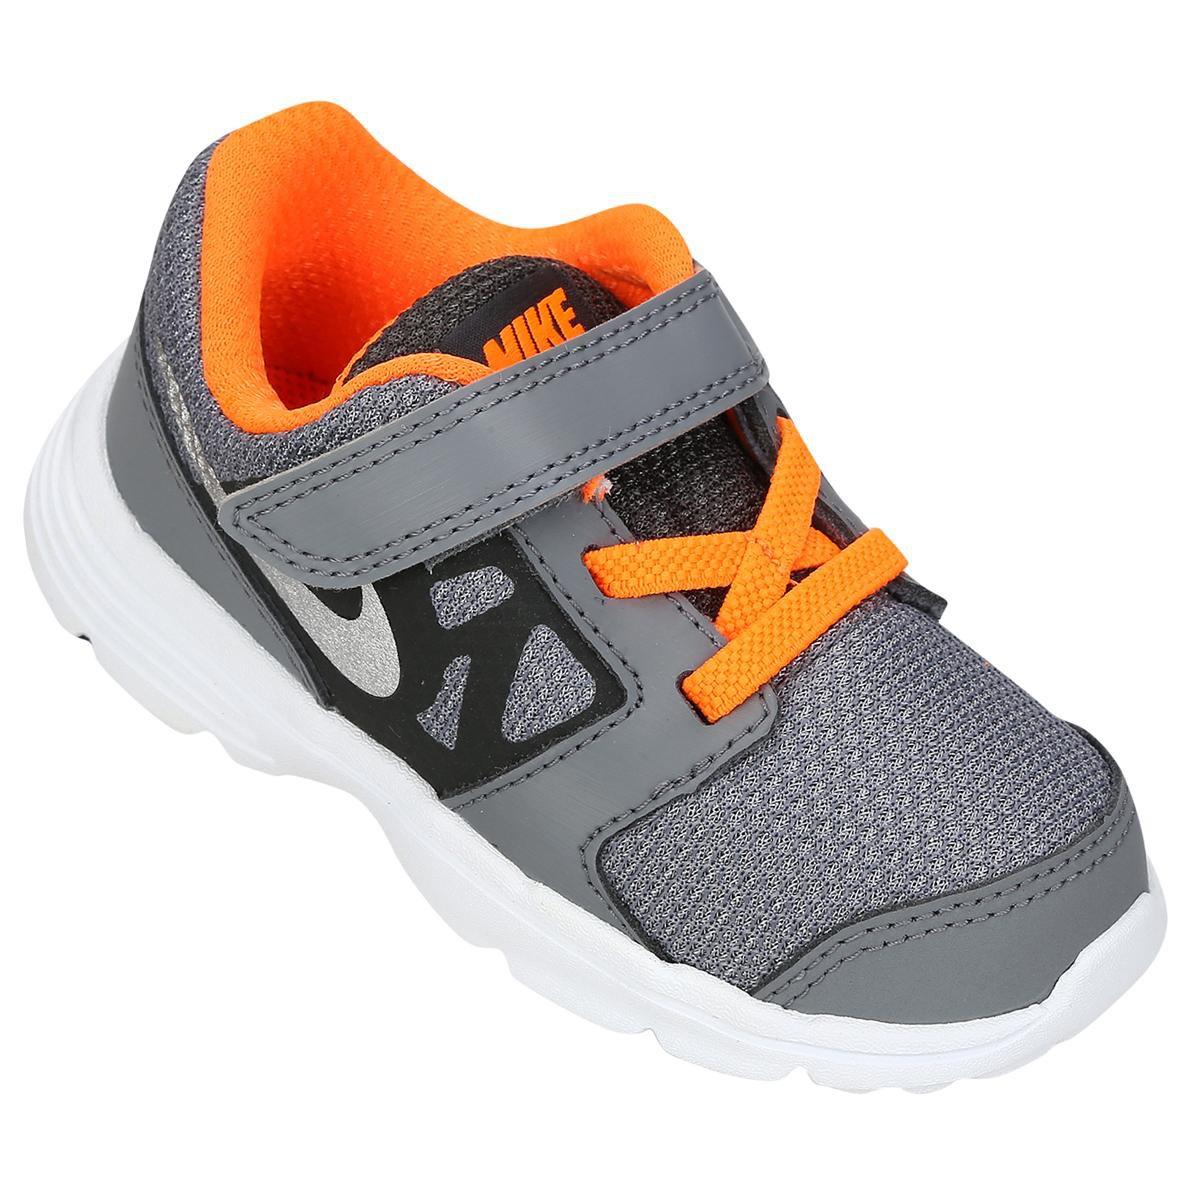 723b424bd Tênis Nike Downshifter 6 Infantil - Compre Agora